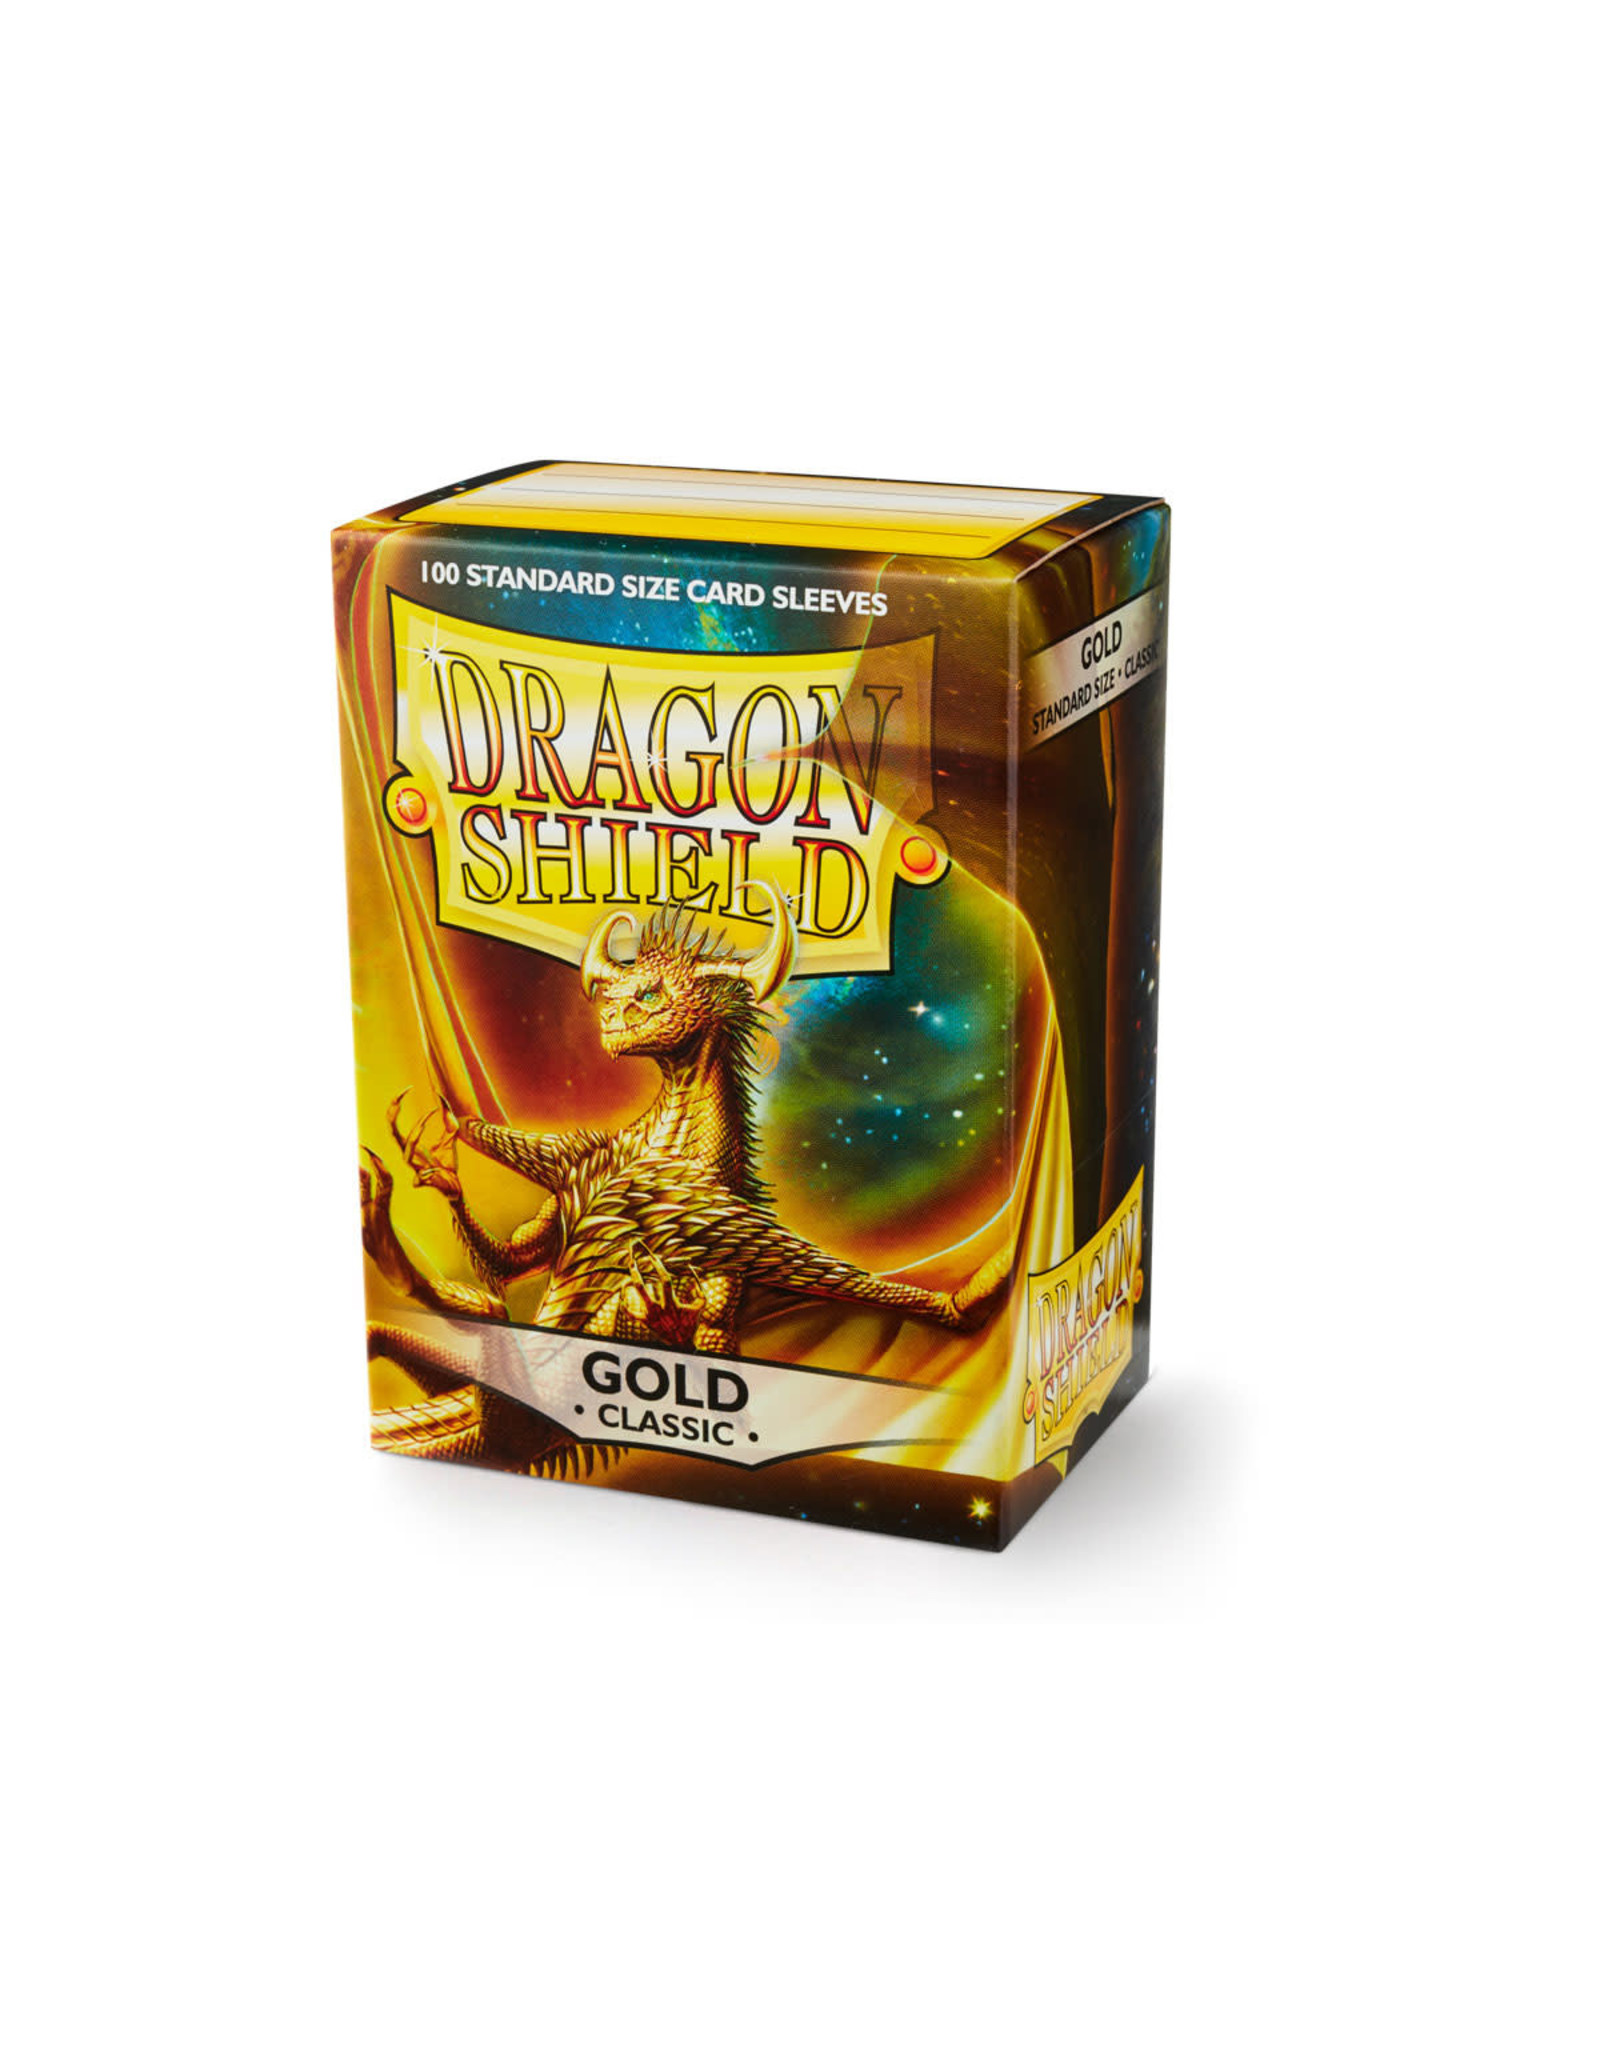 Arcane Tinmen Dragon Shield: Classic Gold Card Sleeves 100 Count